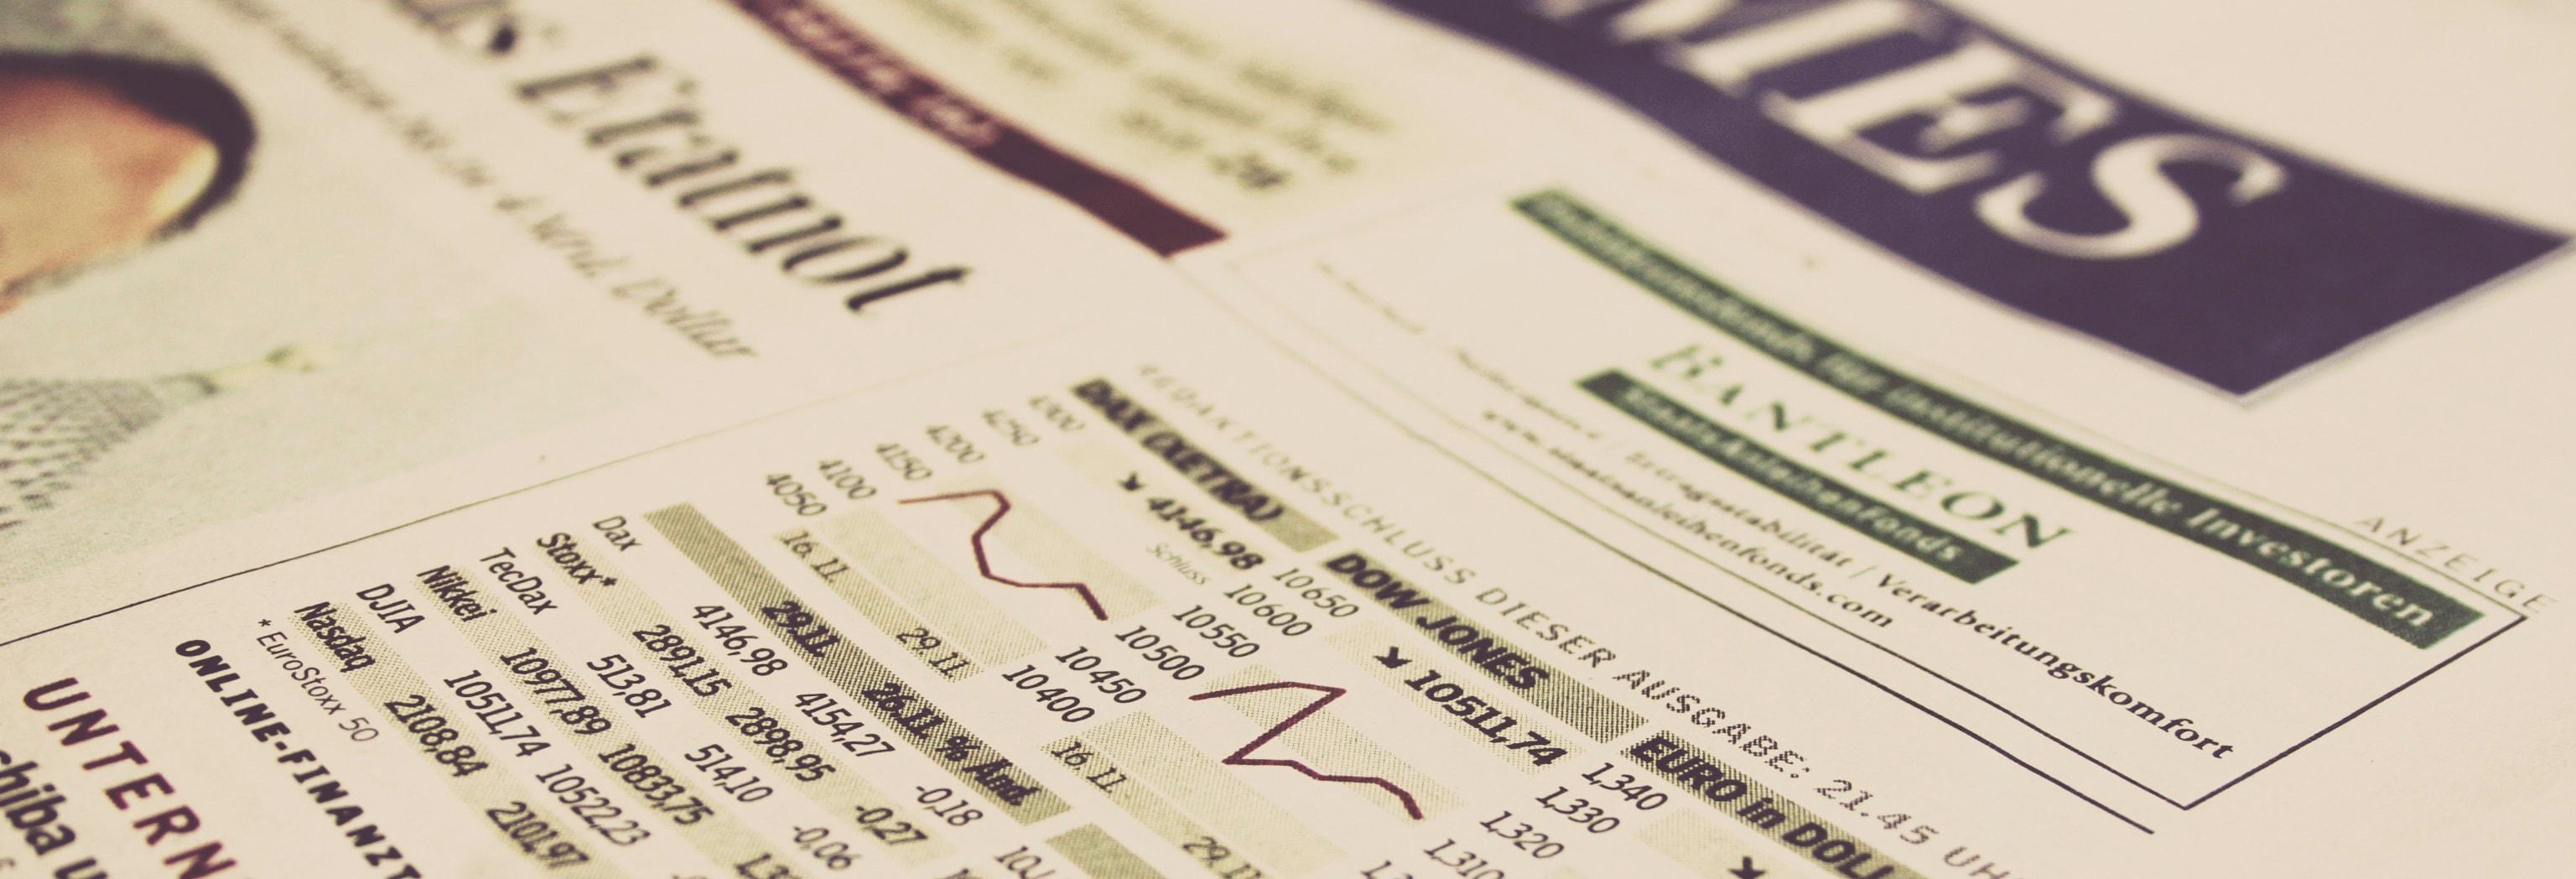 Индекс Nikkei опустился вслед за снижением Dow Jones